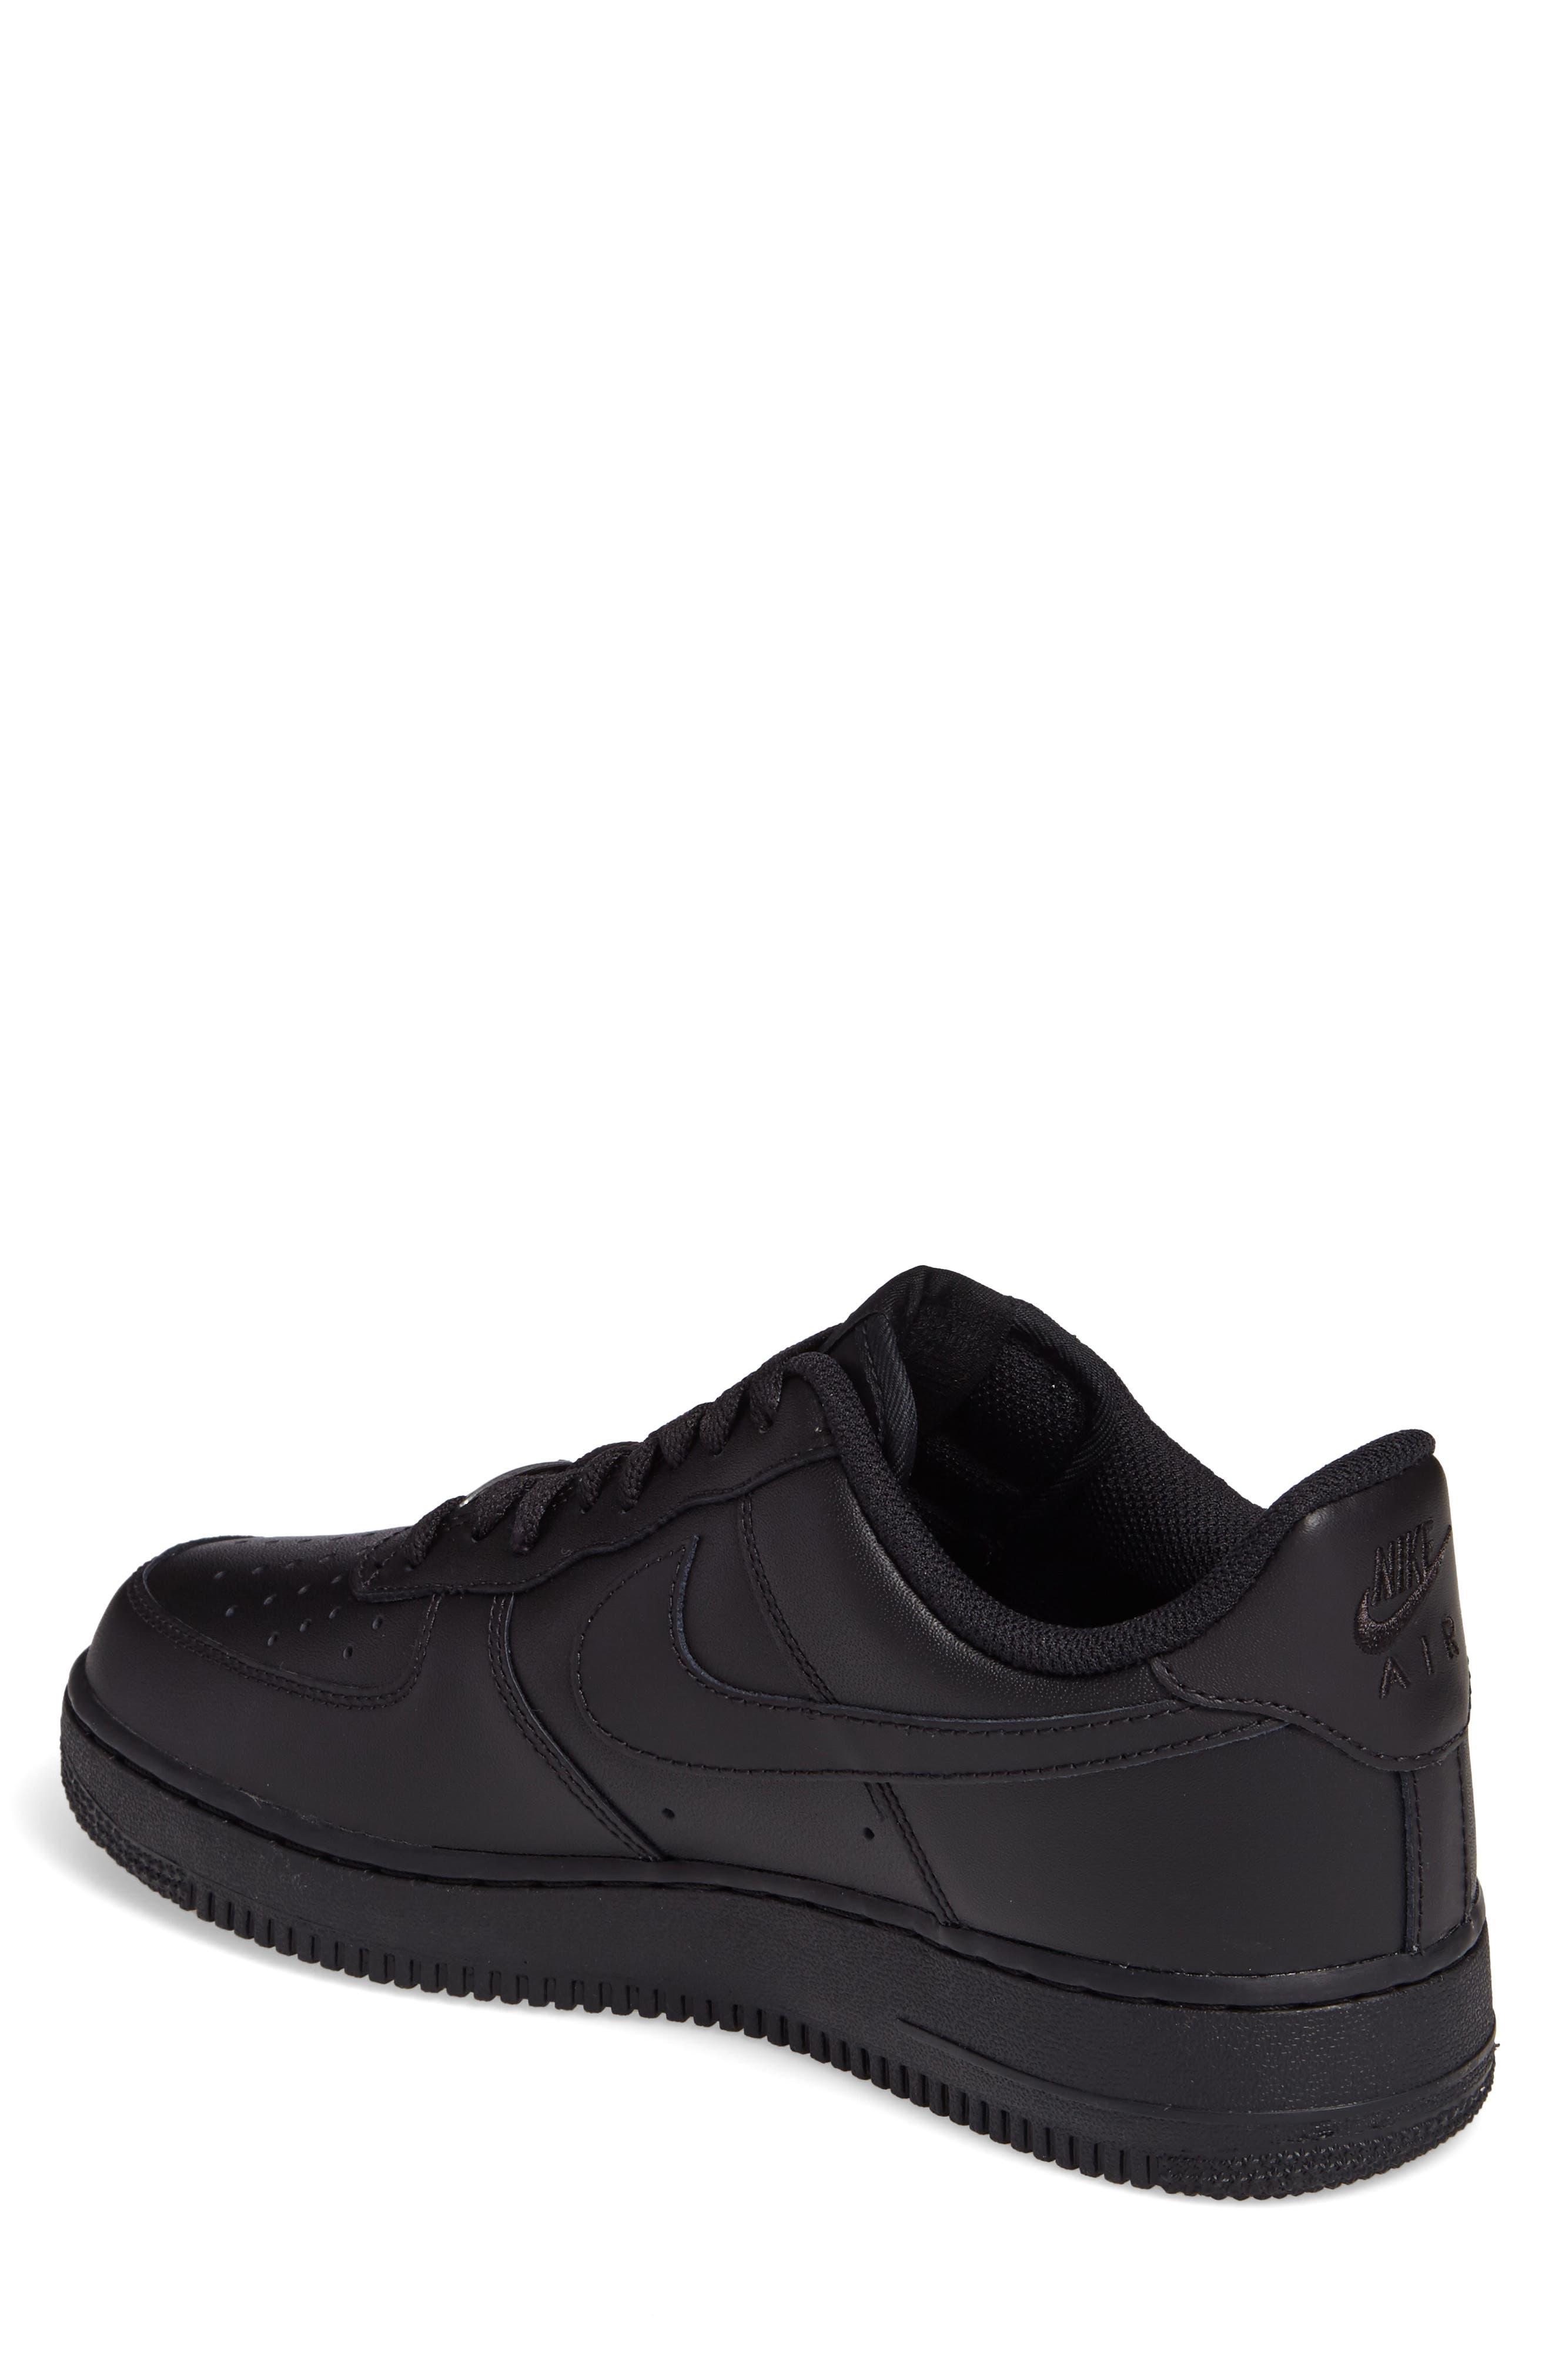 NIKE, Air Force 1 '07 Sneaker, Alternate thumbnail 2, color, BLACK/ BLACK